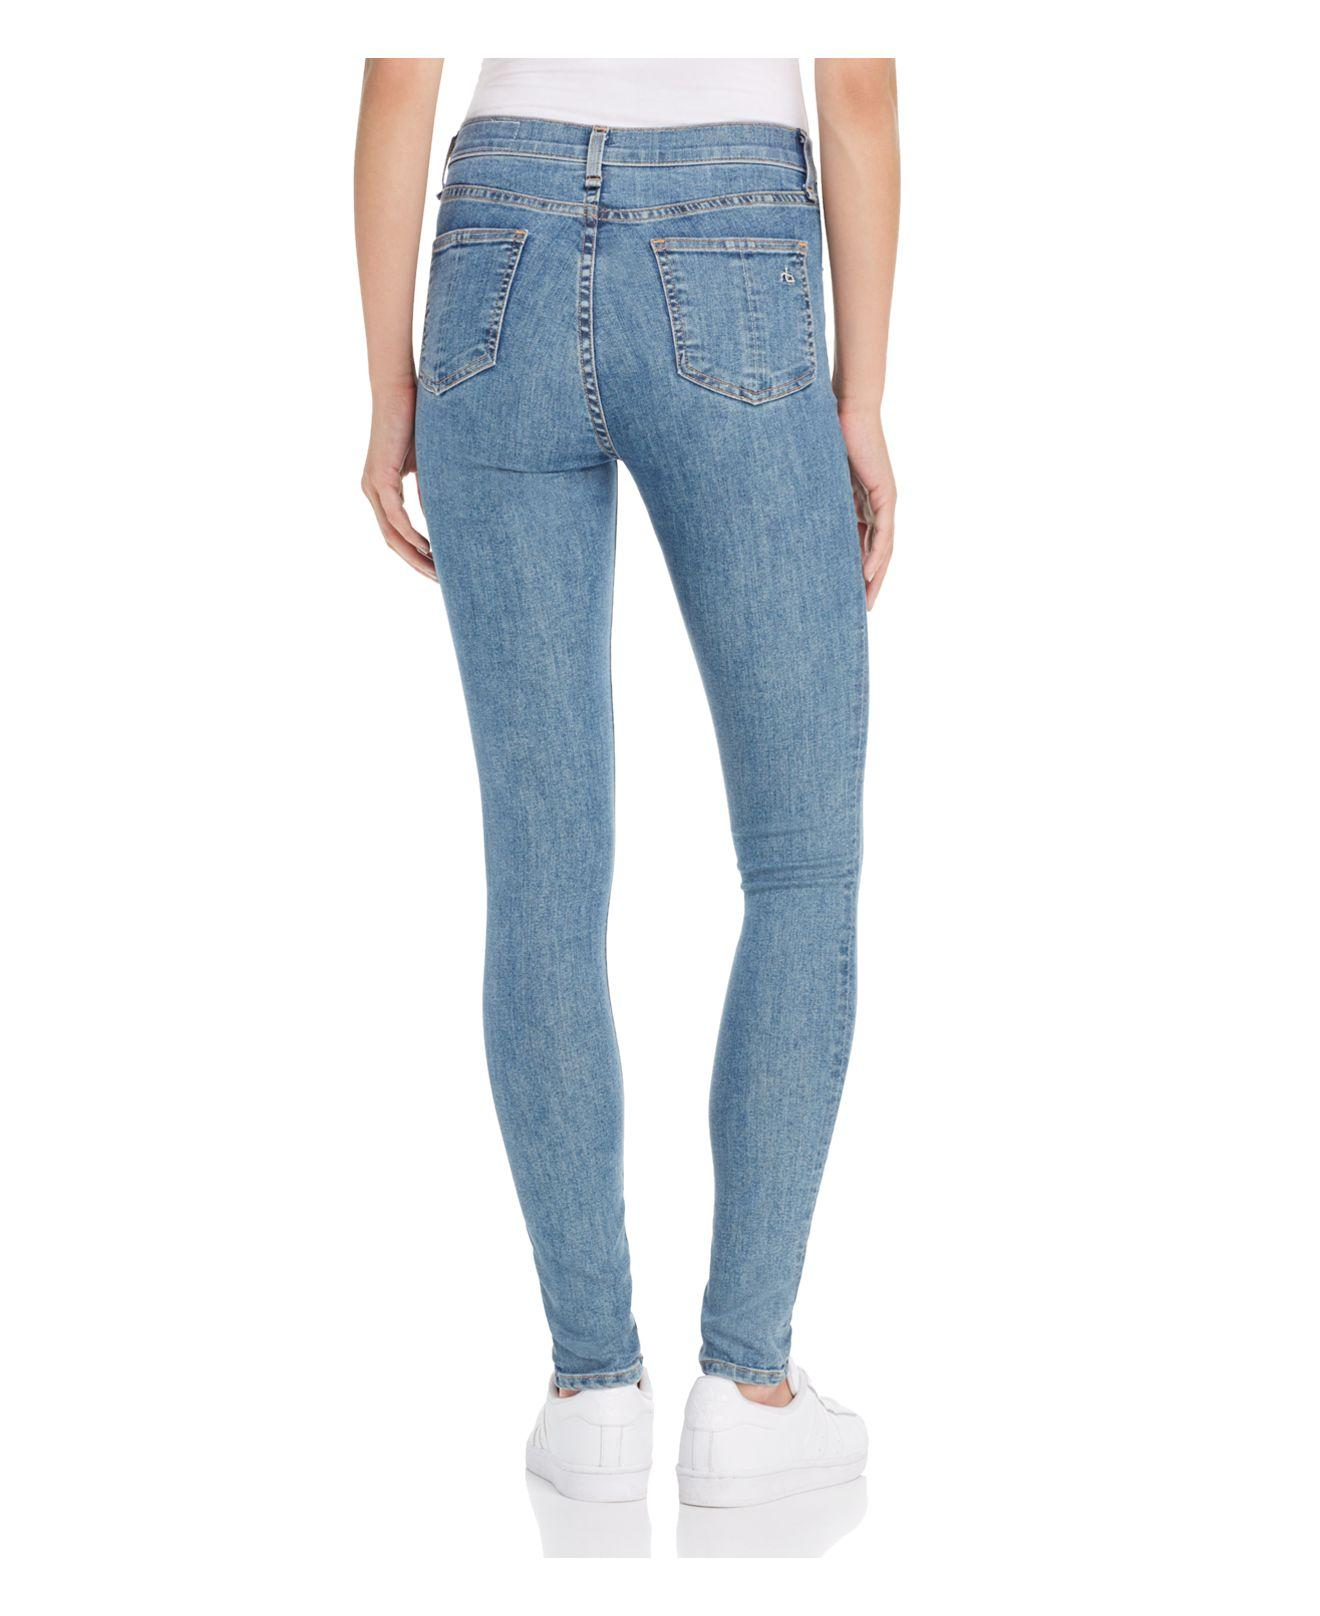 Rag & Bone Denim High Rise Skinny Jeans In Gambel in Blue